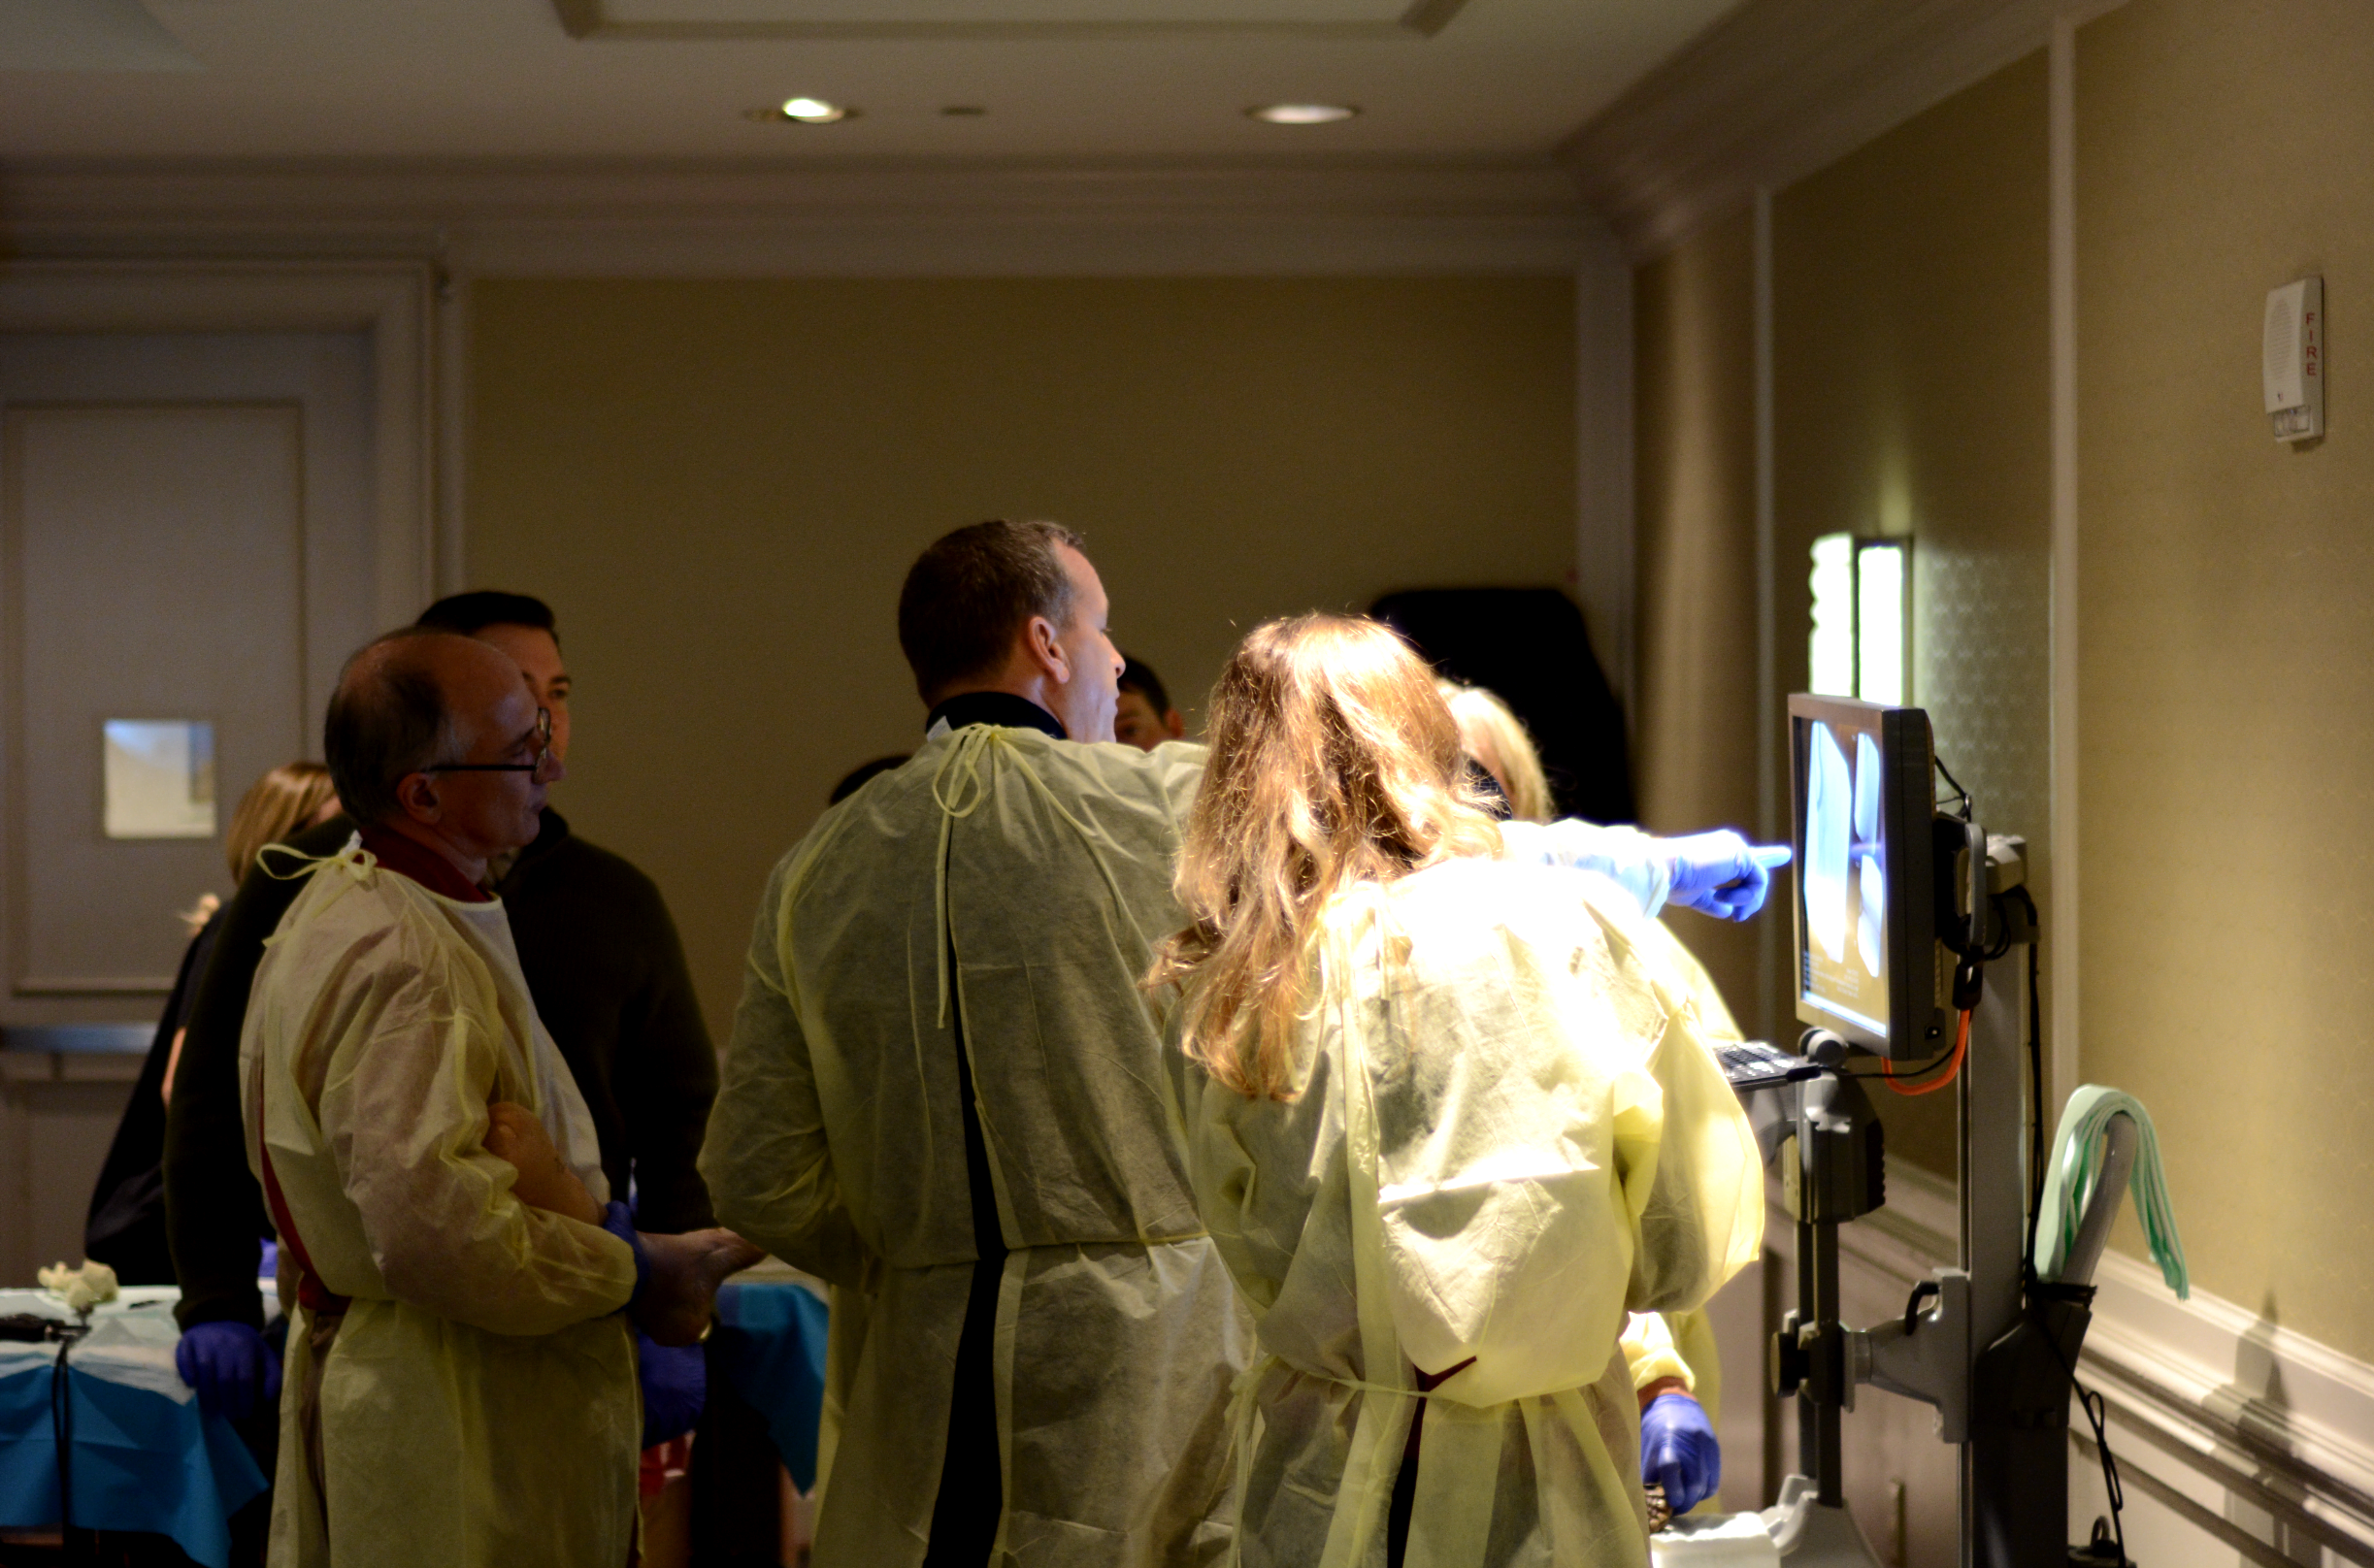 David Redfern Training Bunion Surgery Techniques